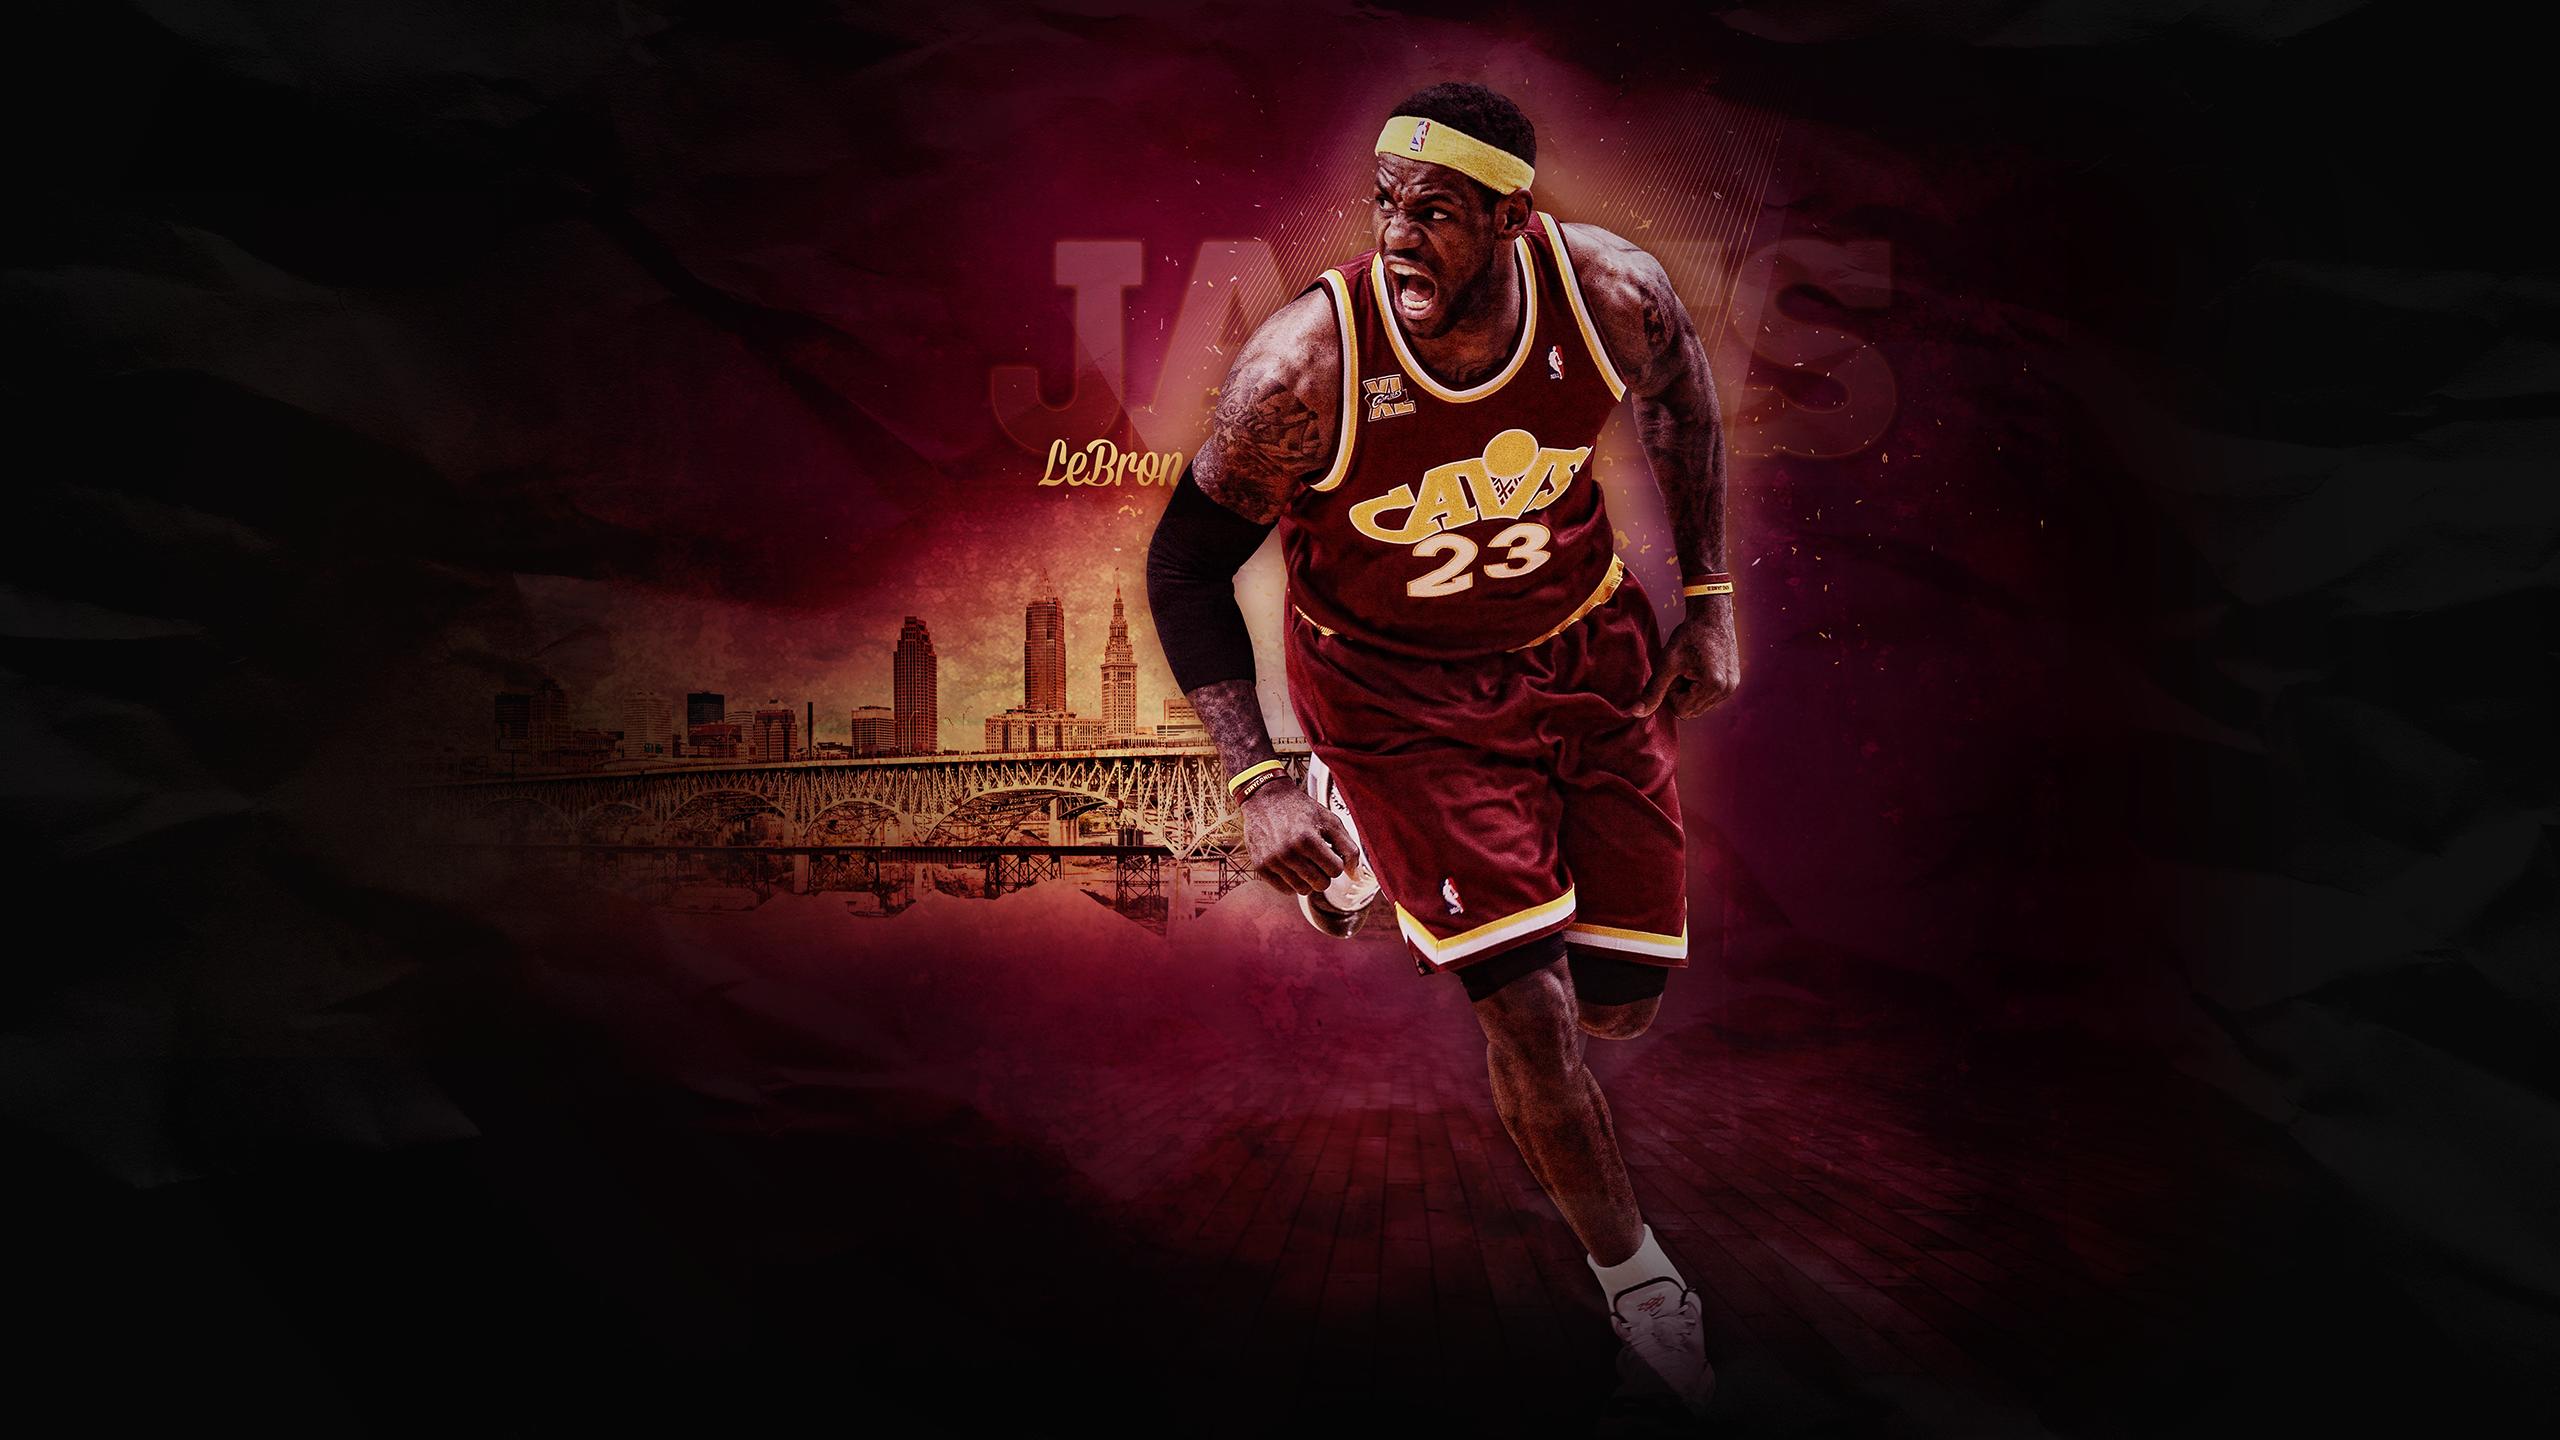 LeBron James by nbacom 2560x1440